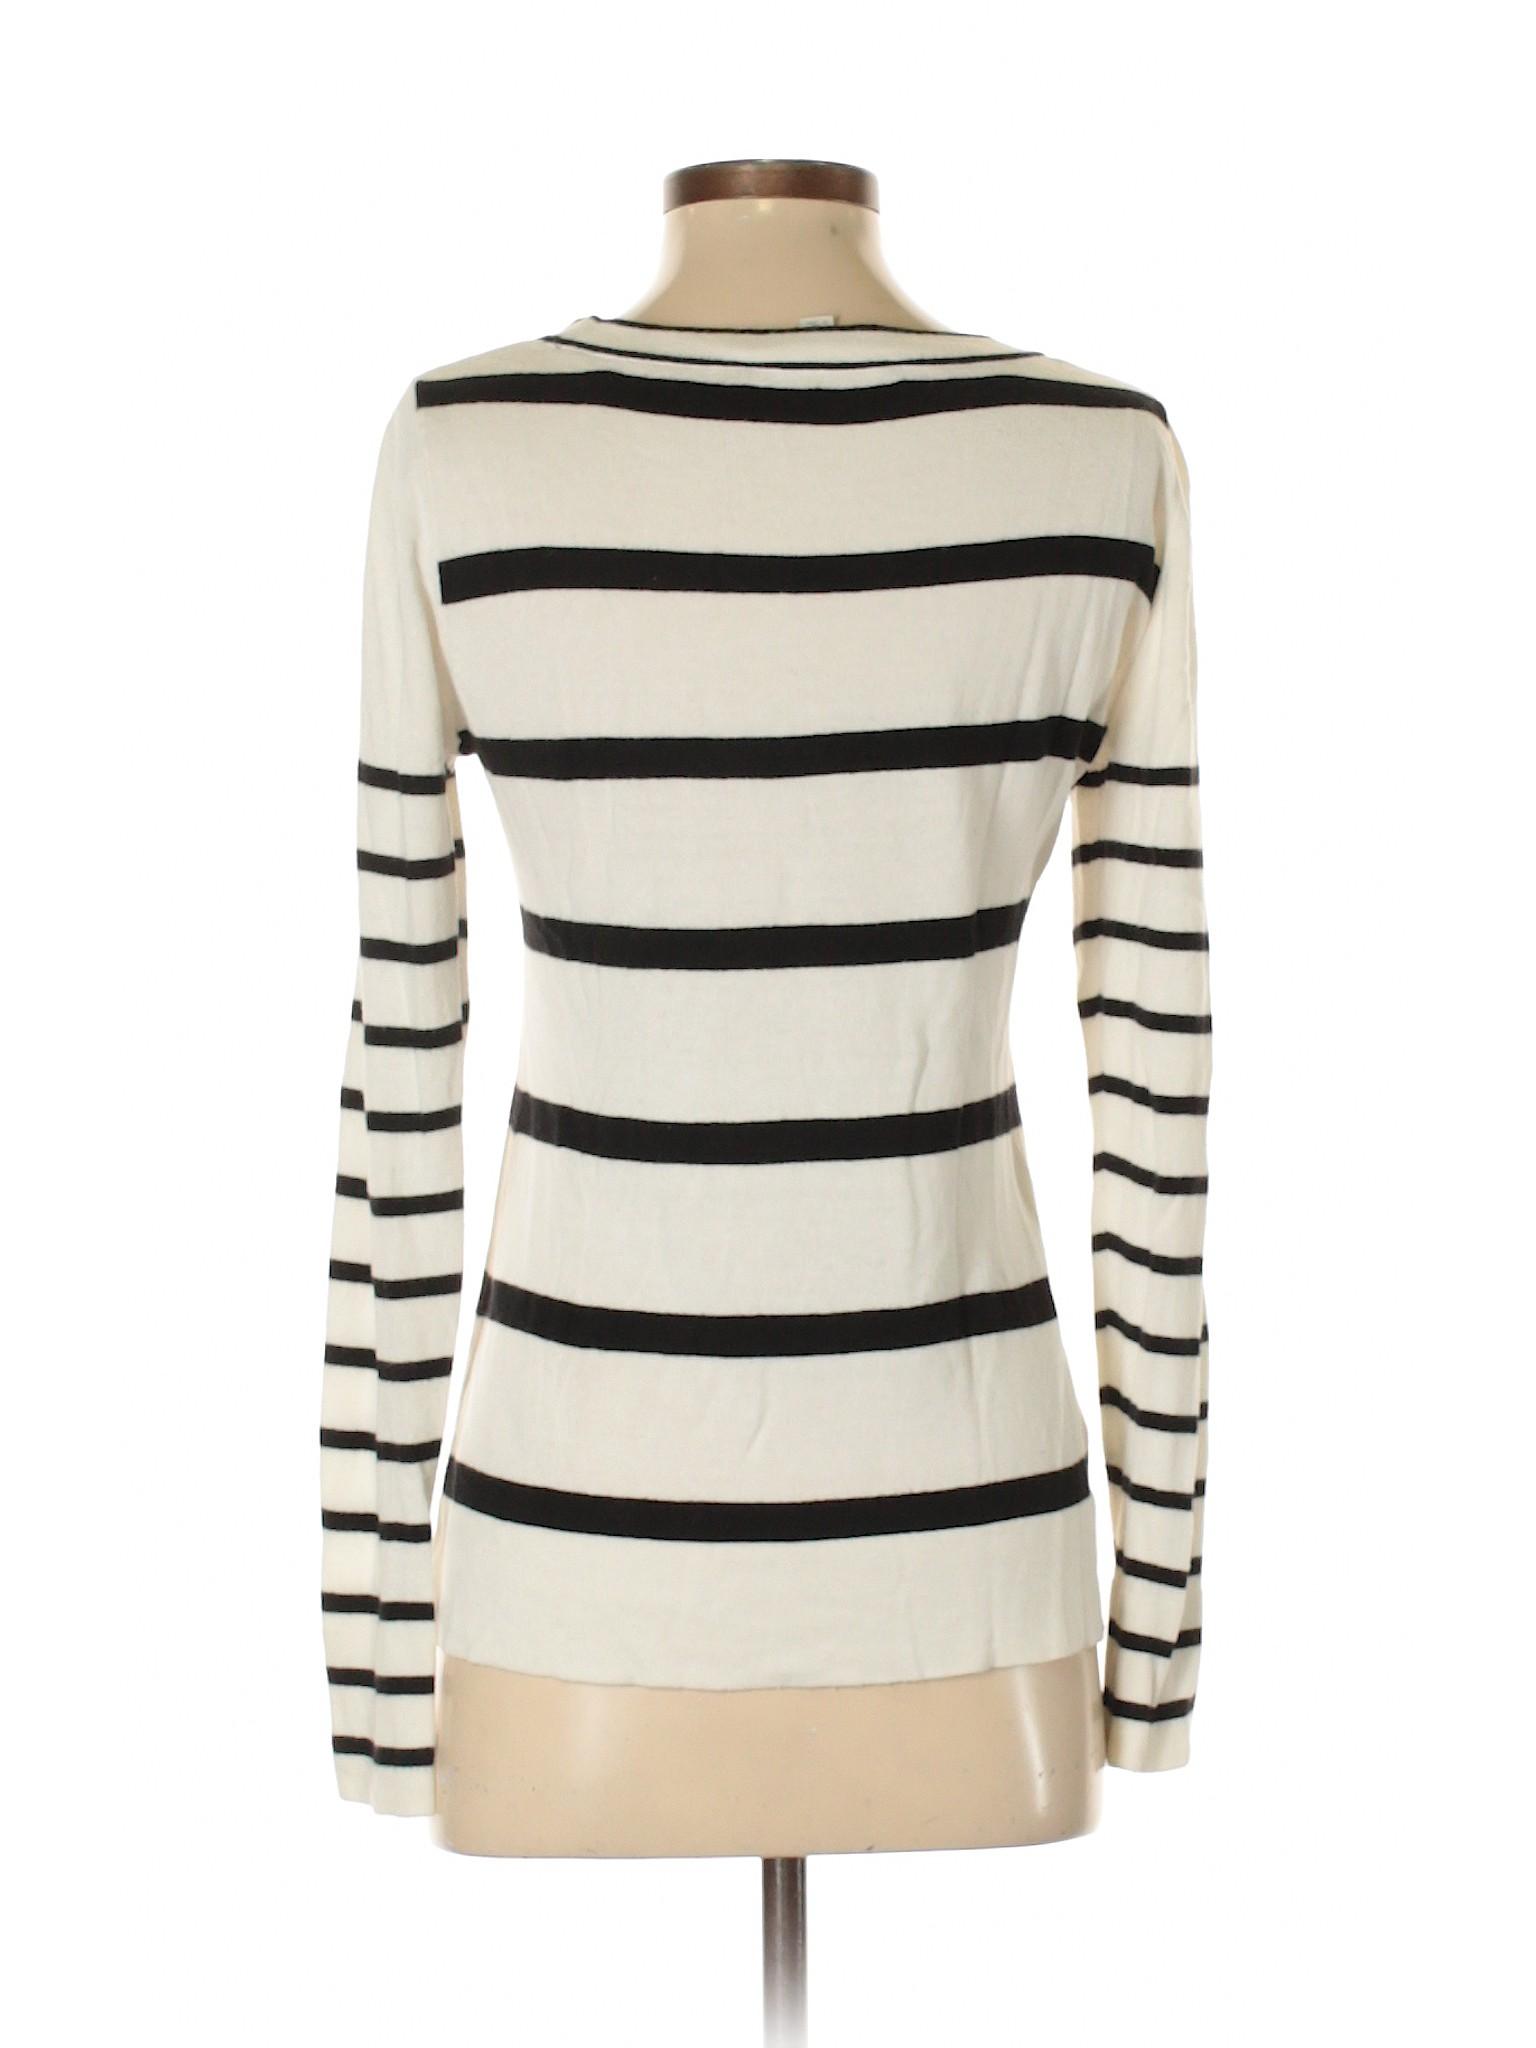 Boutique Ann Loft Sweater Taylor Winter Pullover 8Bz8SP